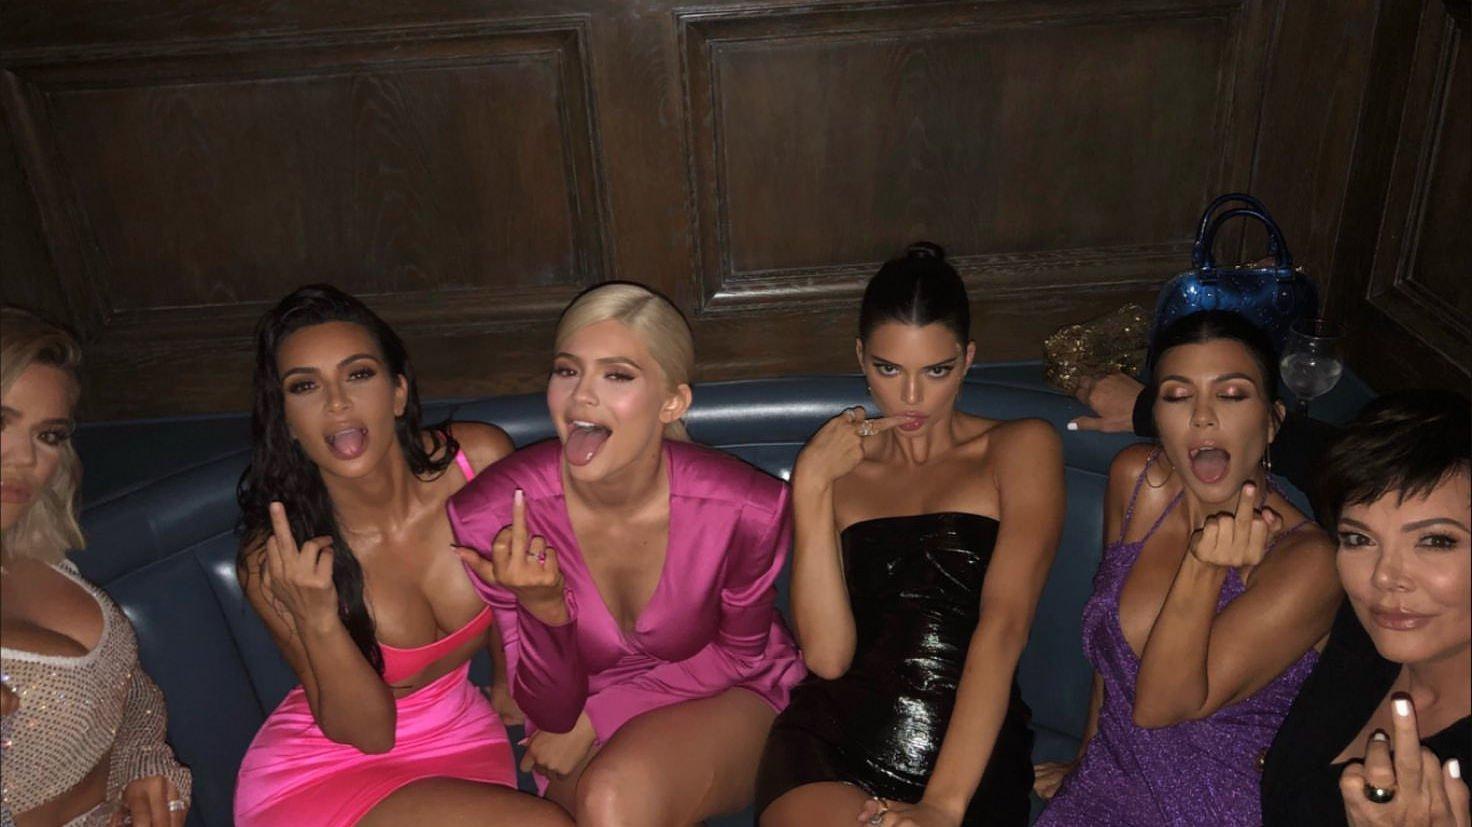 Kim-Kardashian-Sexy-TheFappeningBlog.com-1.jpg